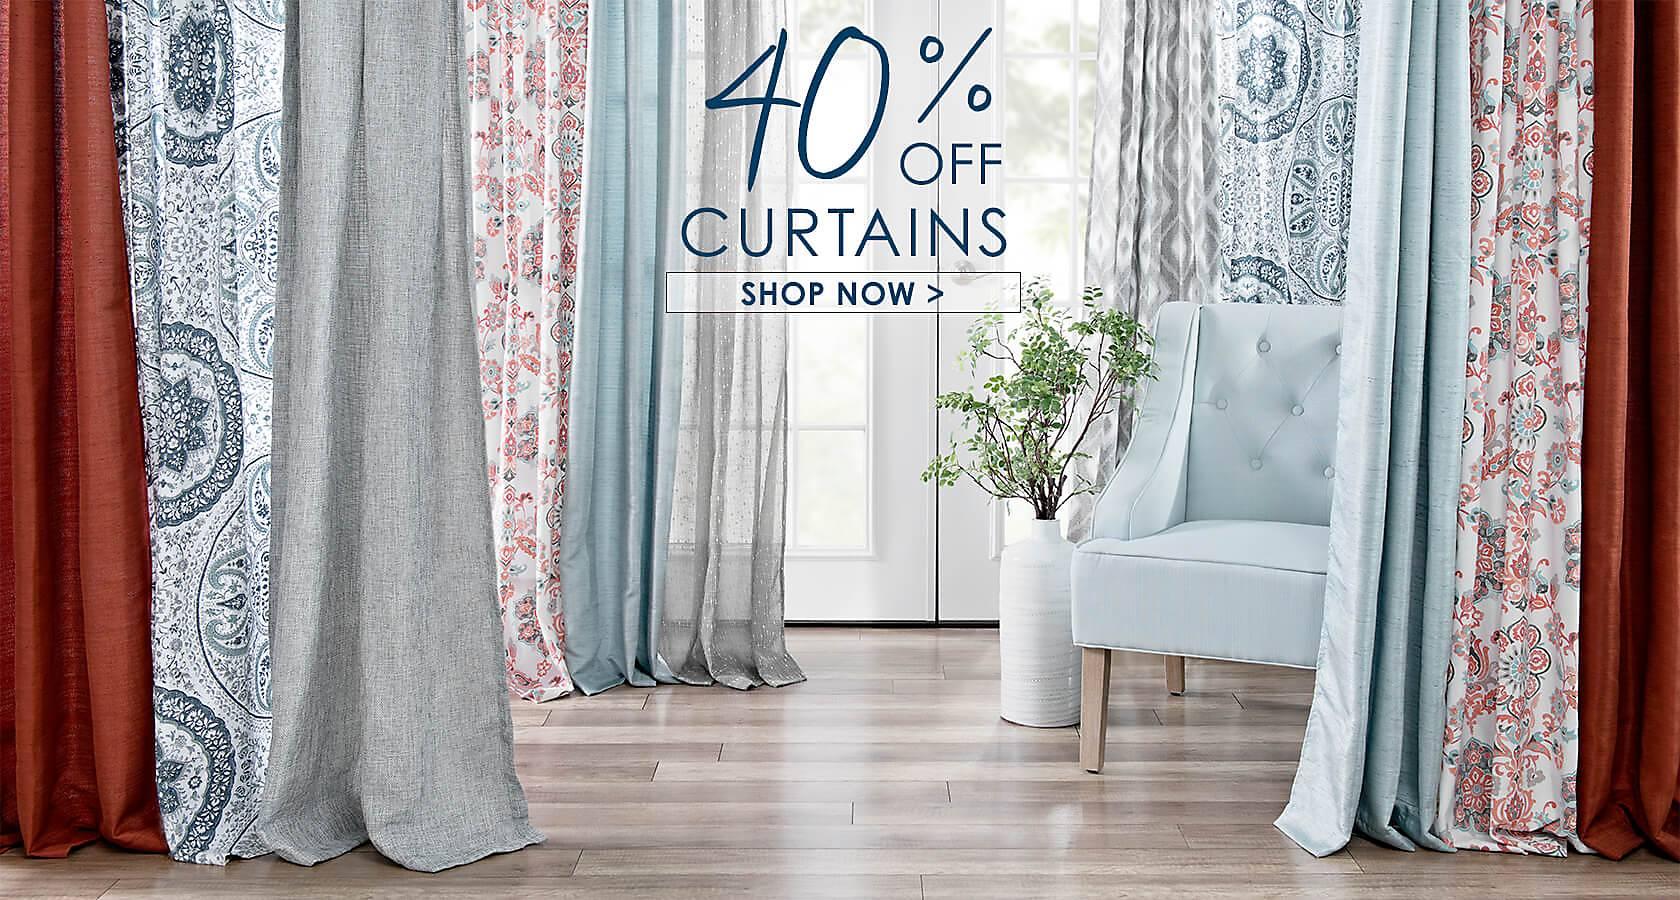 40% Off Curtains - Shop Now